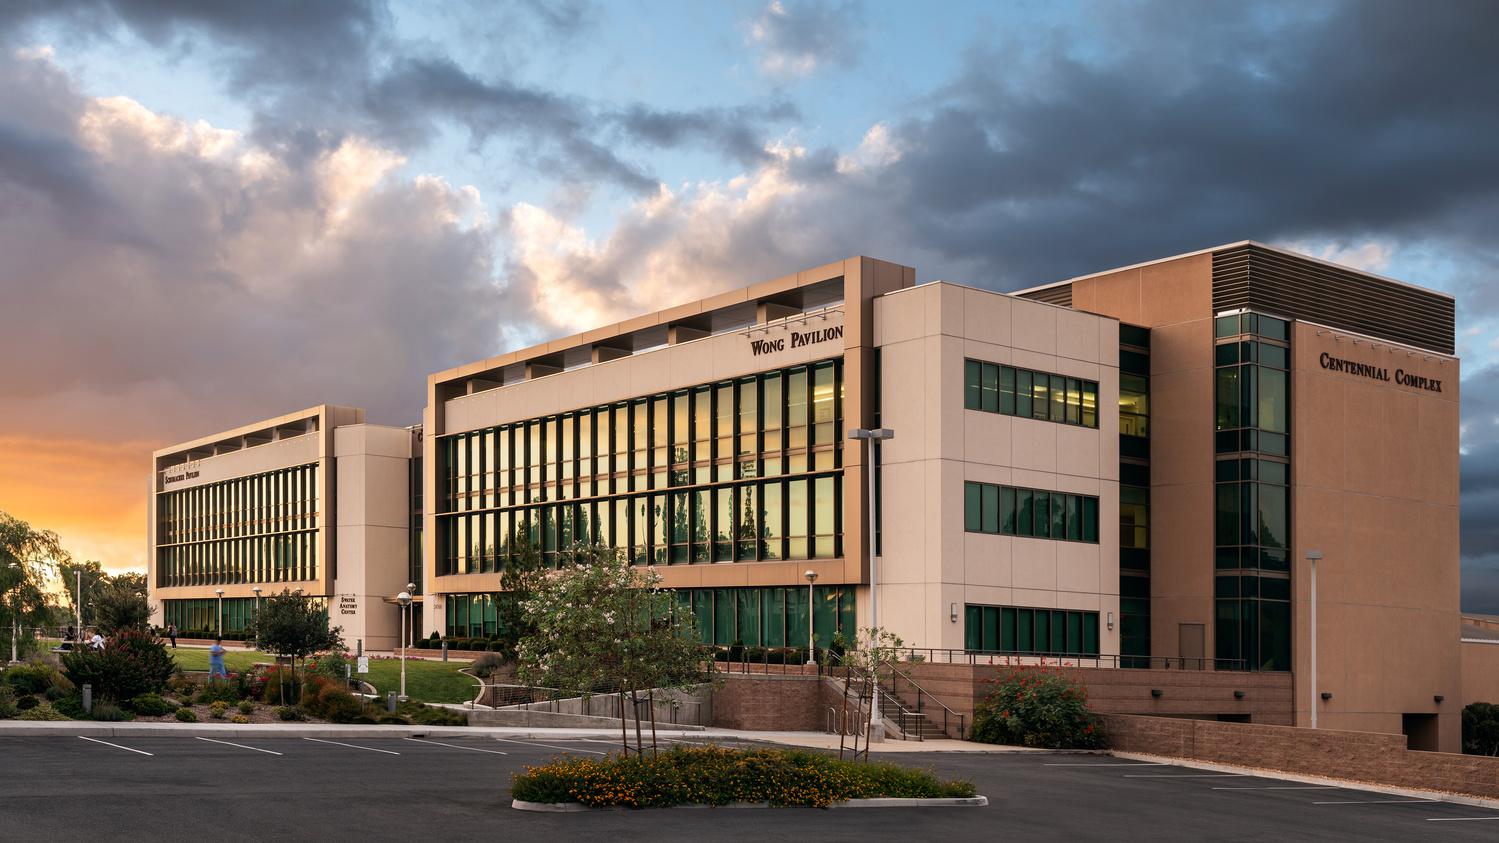 Centennial Complex at Loma Linda University by Jonathan Davidson